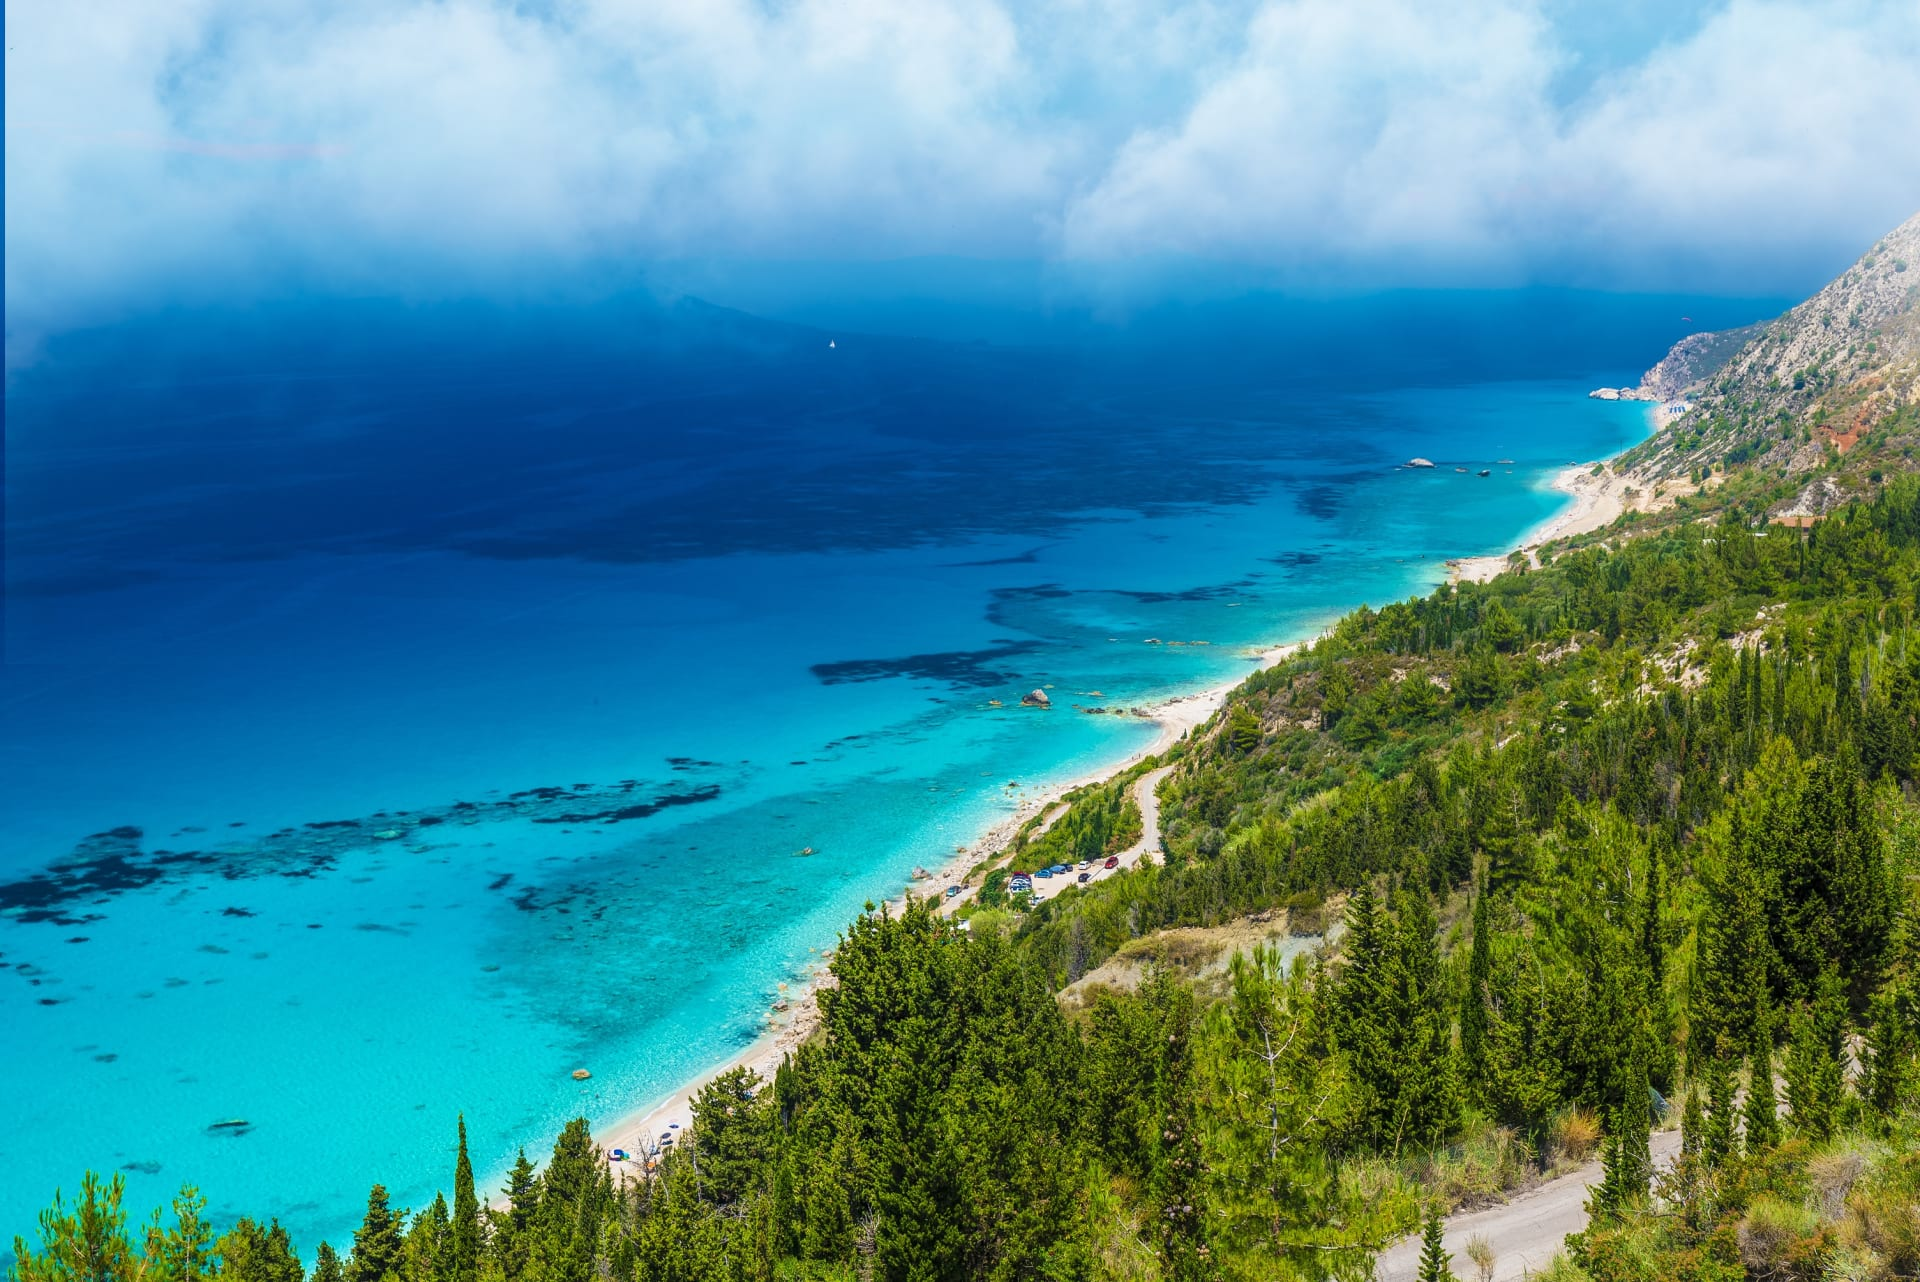 Kalamitsi beach, tirquoise water